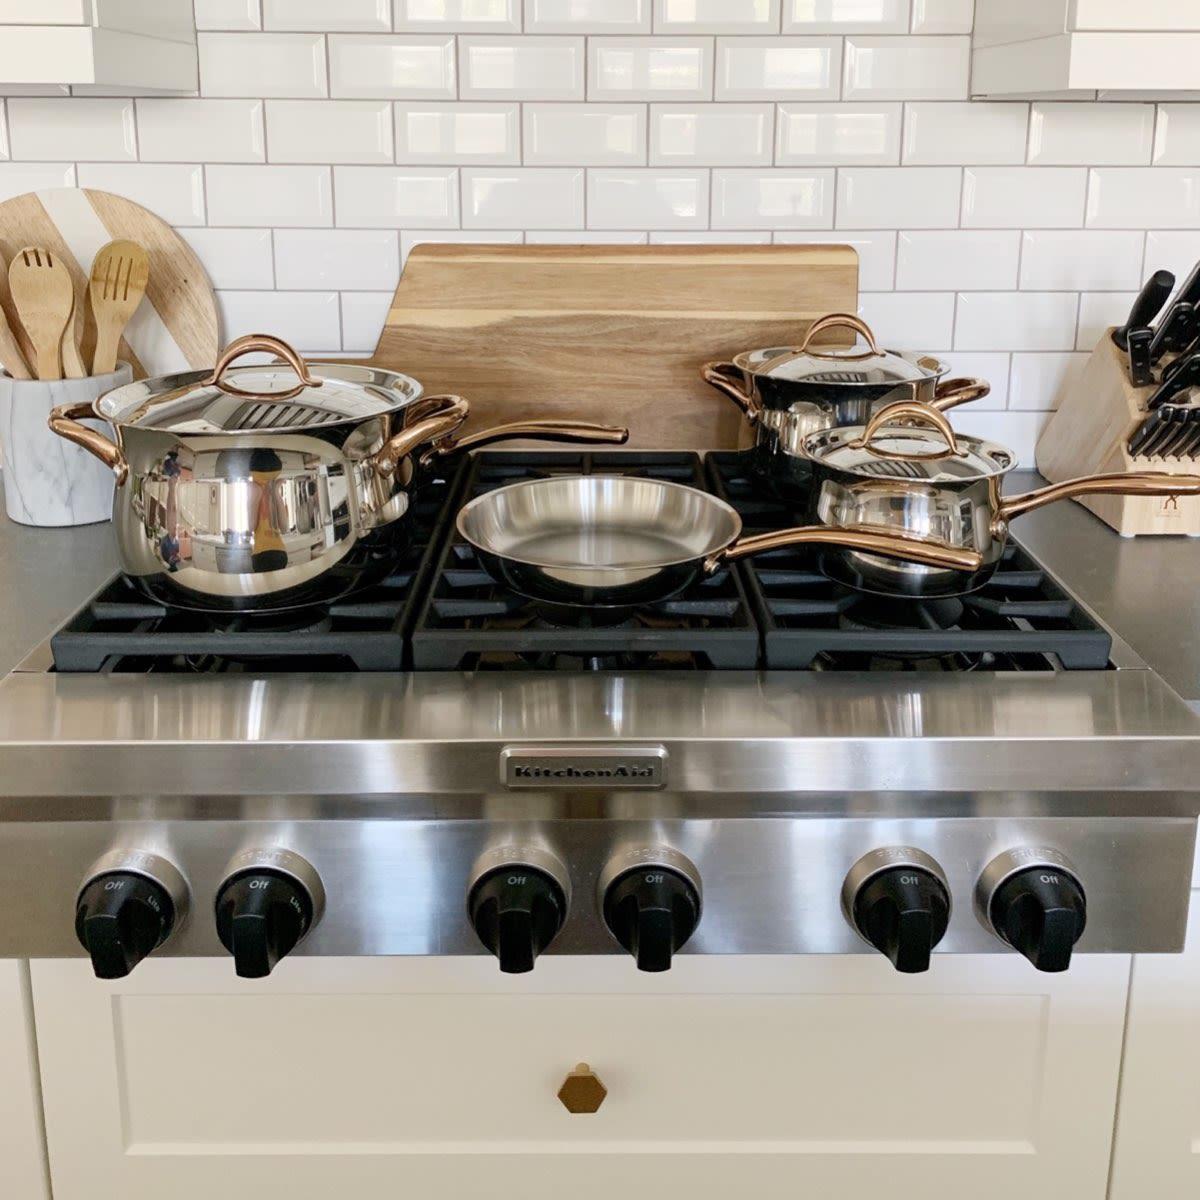 Kitchen pots and pans